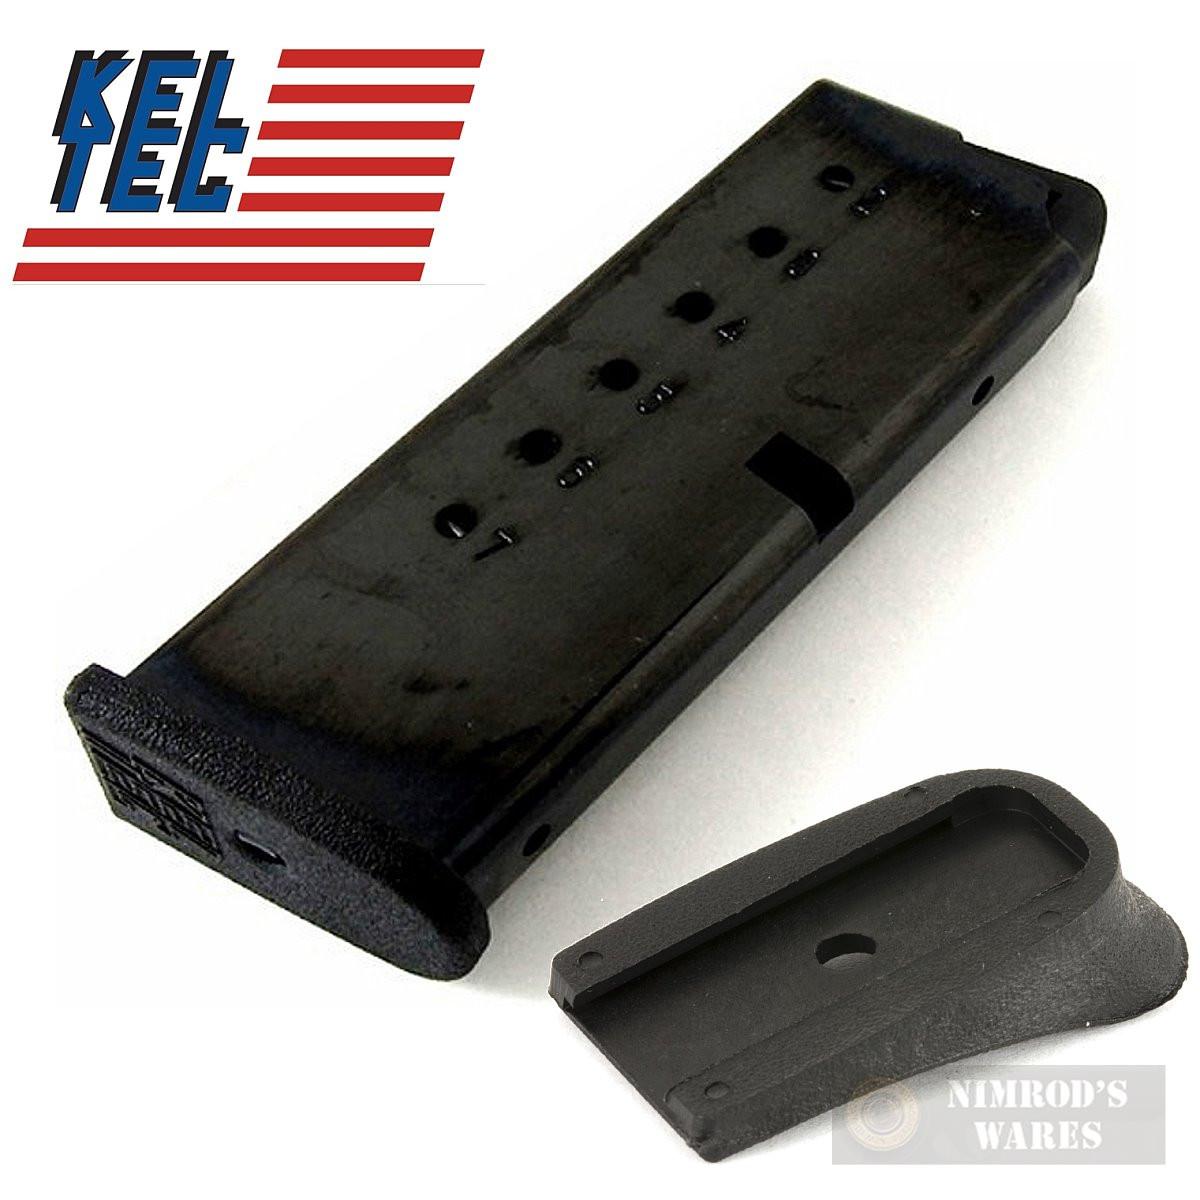 Kel-Tec PF9 PF-9 9mm 7 Round MAGAZINE + Grip Extension PF9-498 PF9-492